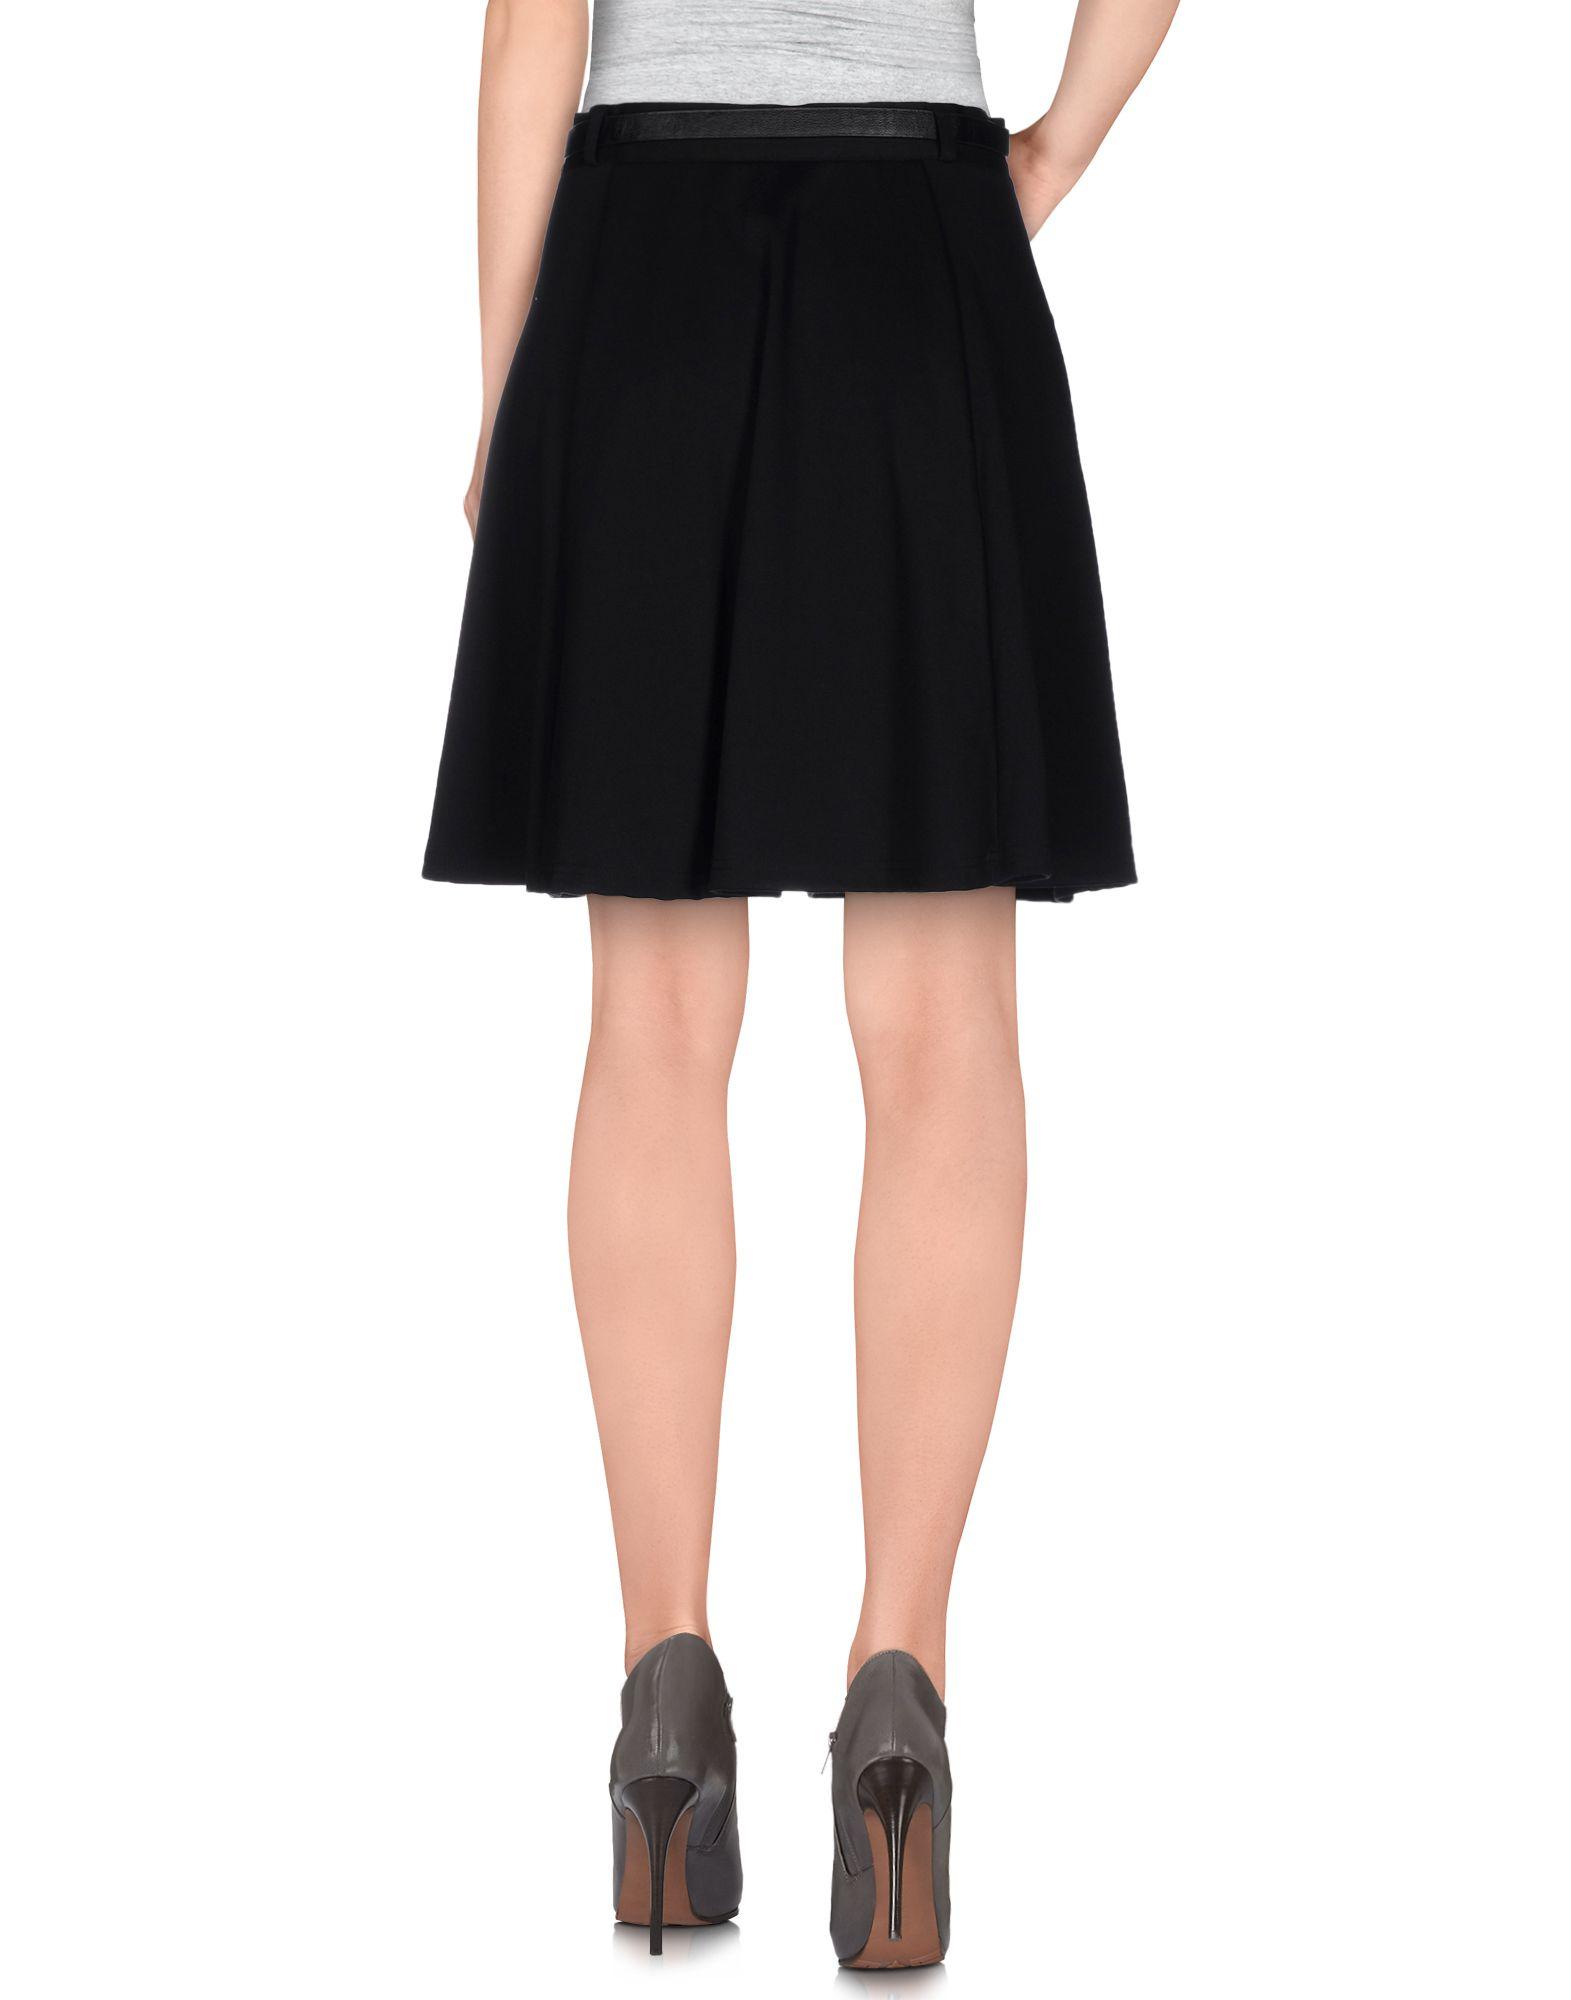 vero moda knee length skirt in black lyst. Black Bedroom Furniture Sets. Home Design Ideas